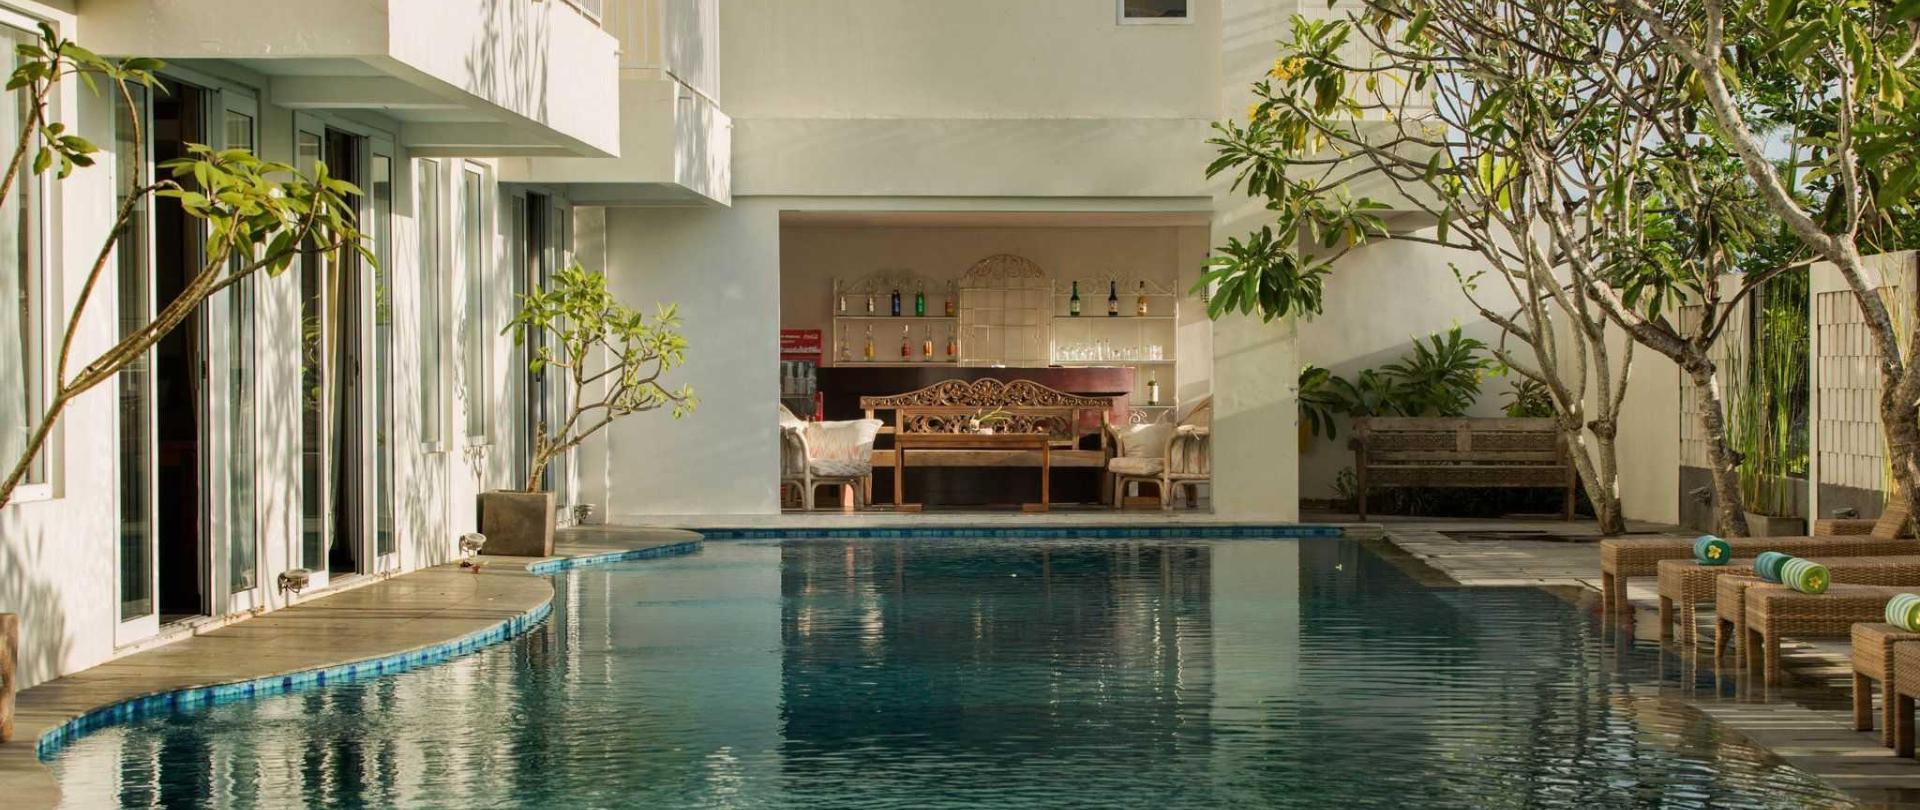 pool-bar-2.jpg